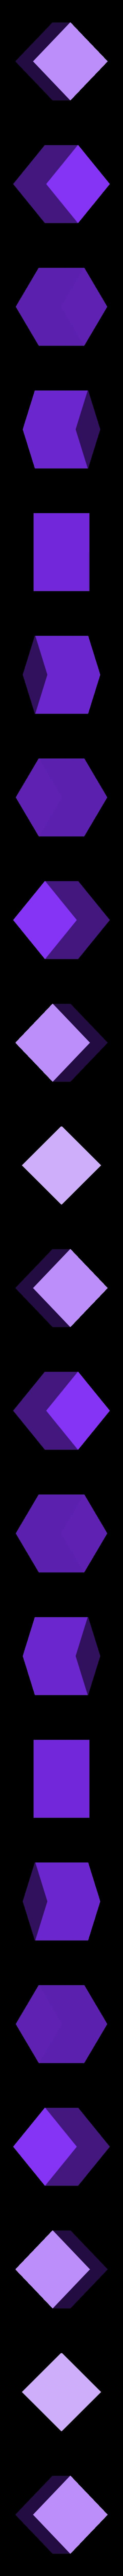 Cube Shape.obj Download free OBJ file Cube Shape • 3D printing template, 3DBuilder